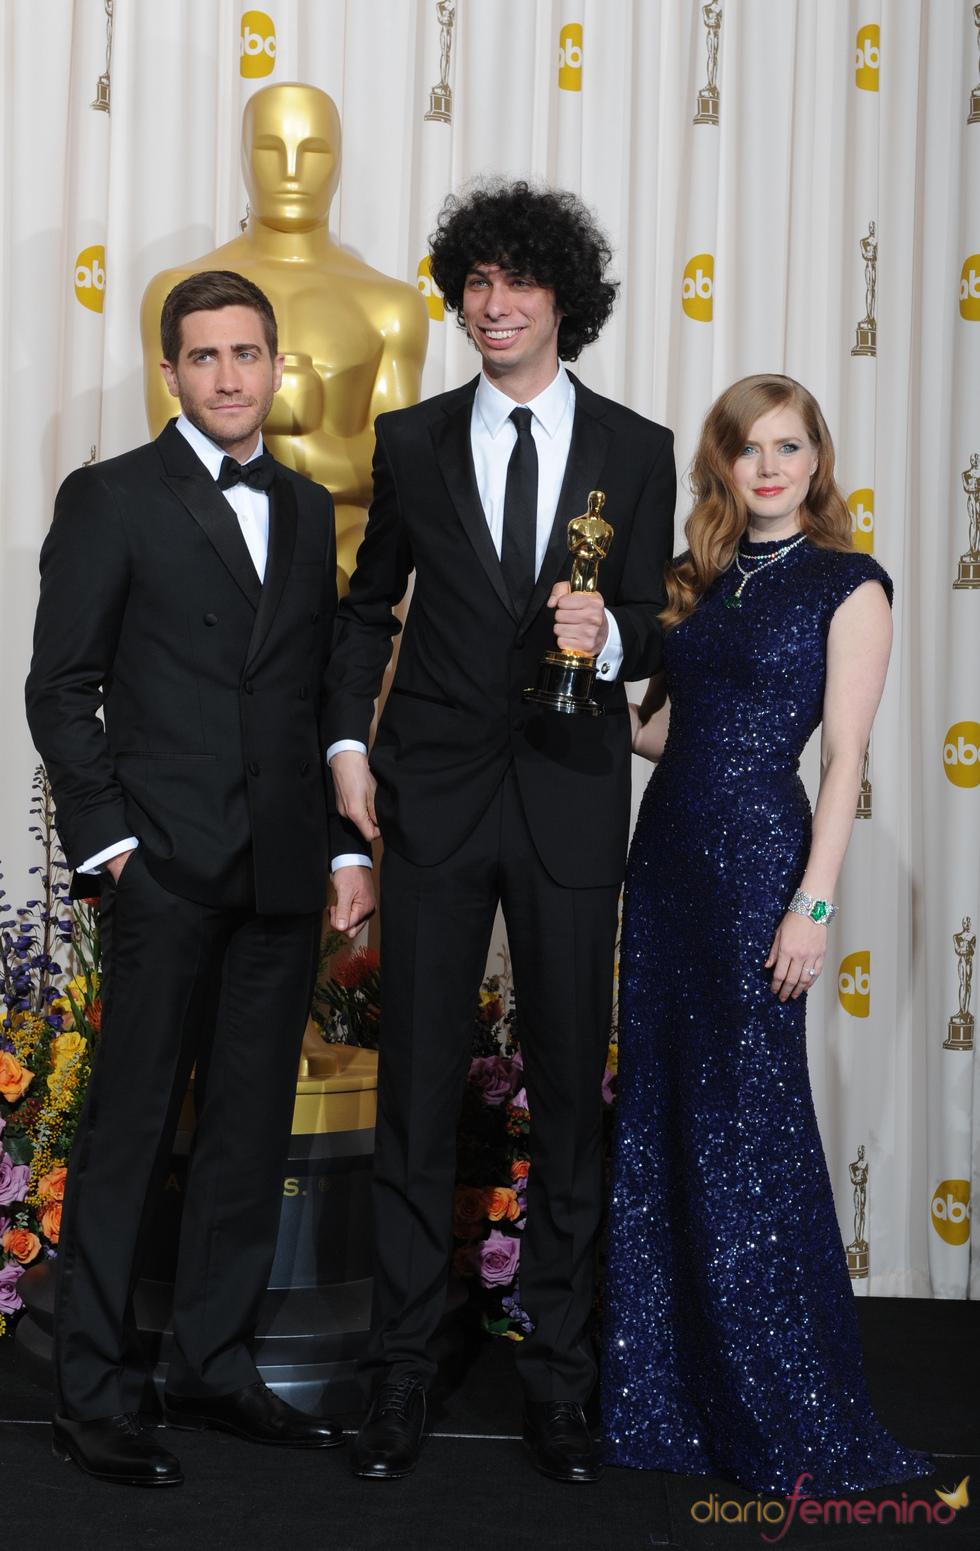 Jack Gyllenhaal y Amy Adams posan con Luke Matheny, Oscar 2011 a 'Mejor cortometraje'